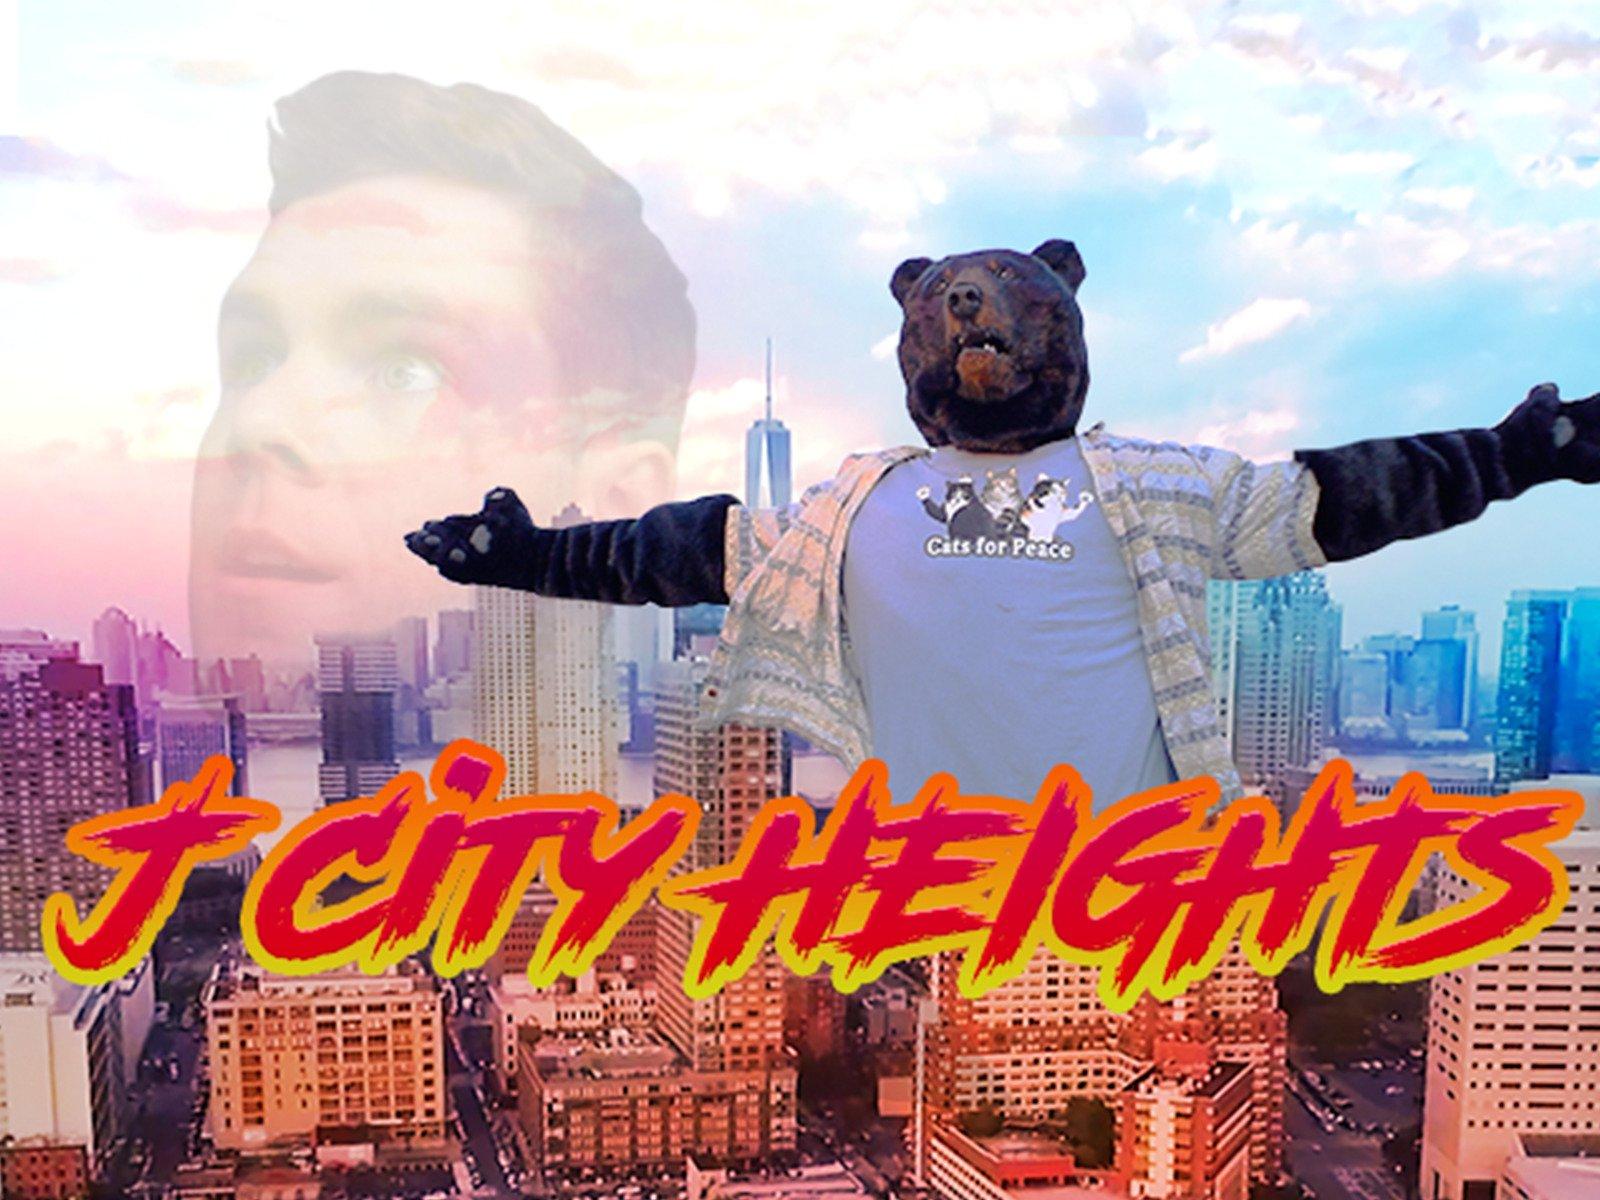 J City Heights - Season 1